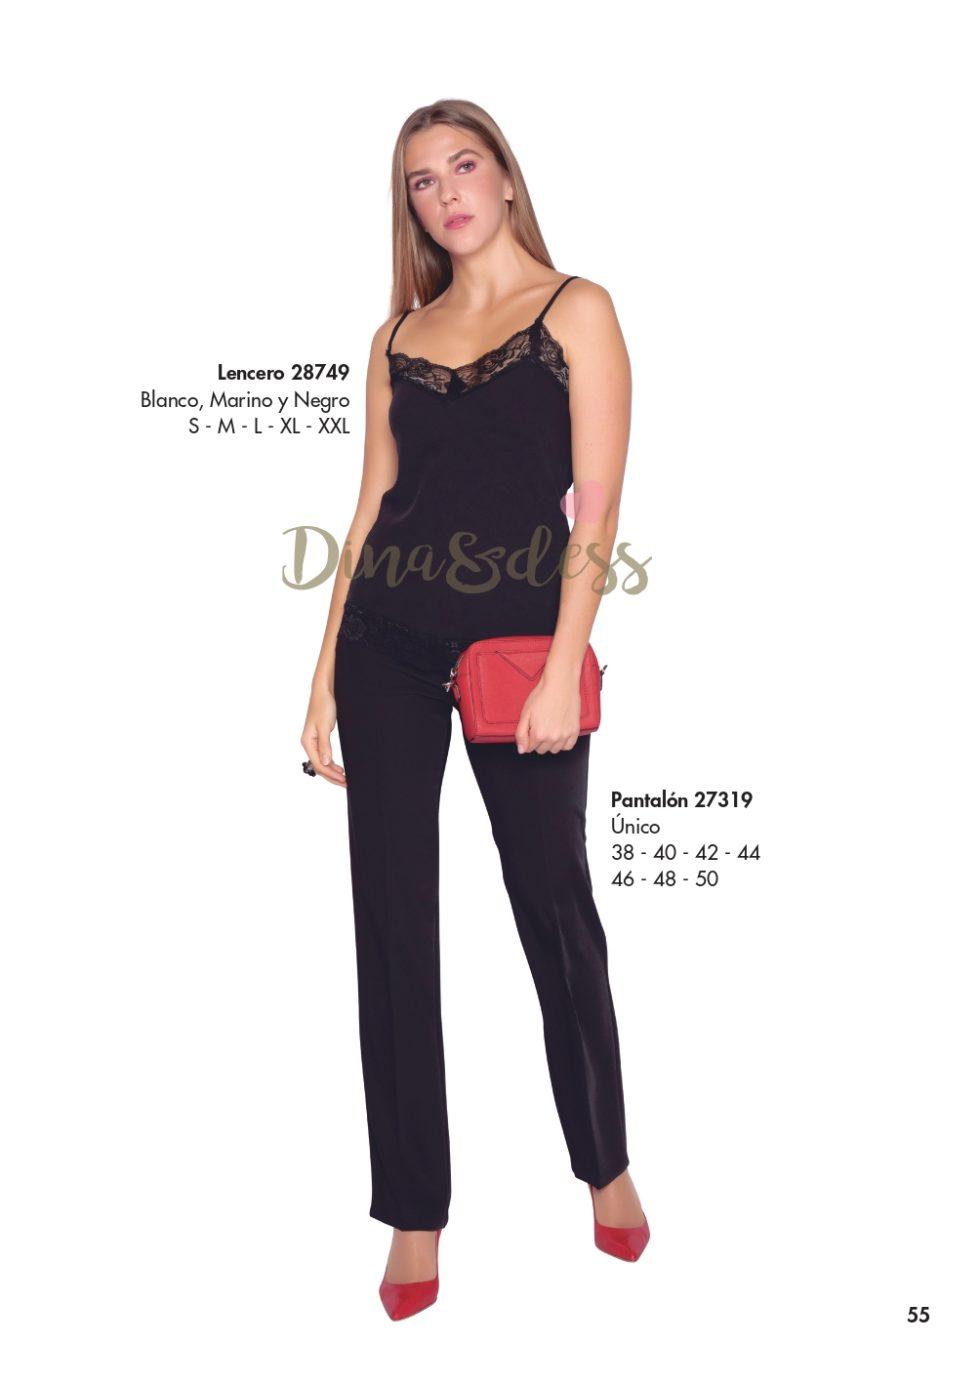 Verano 2021 Dina&Dess Clientes_page-0057